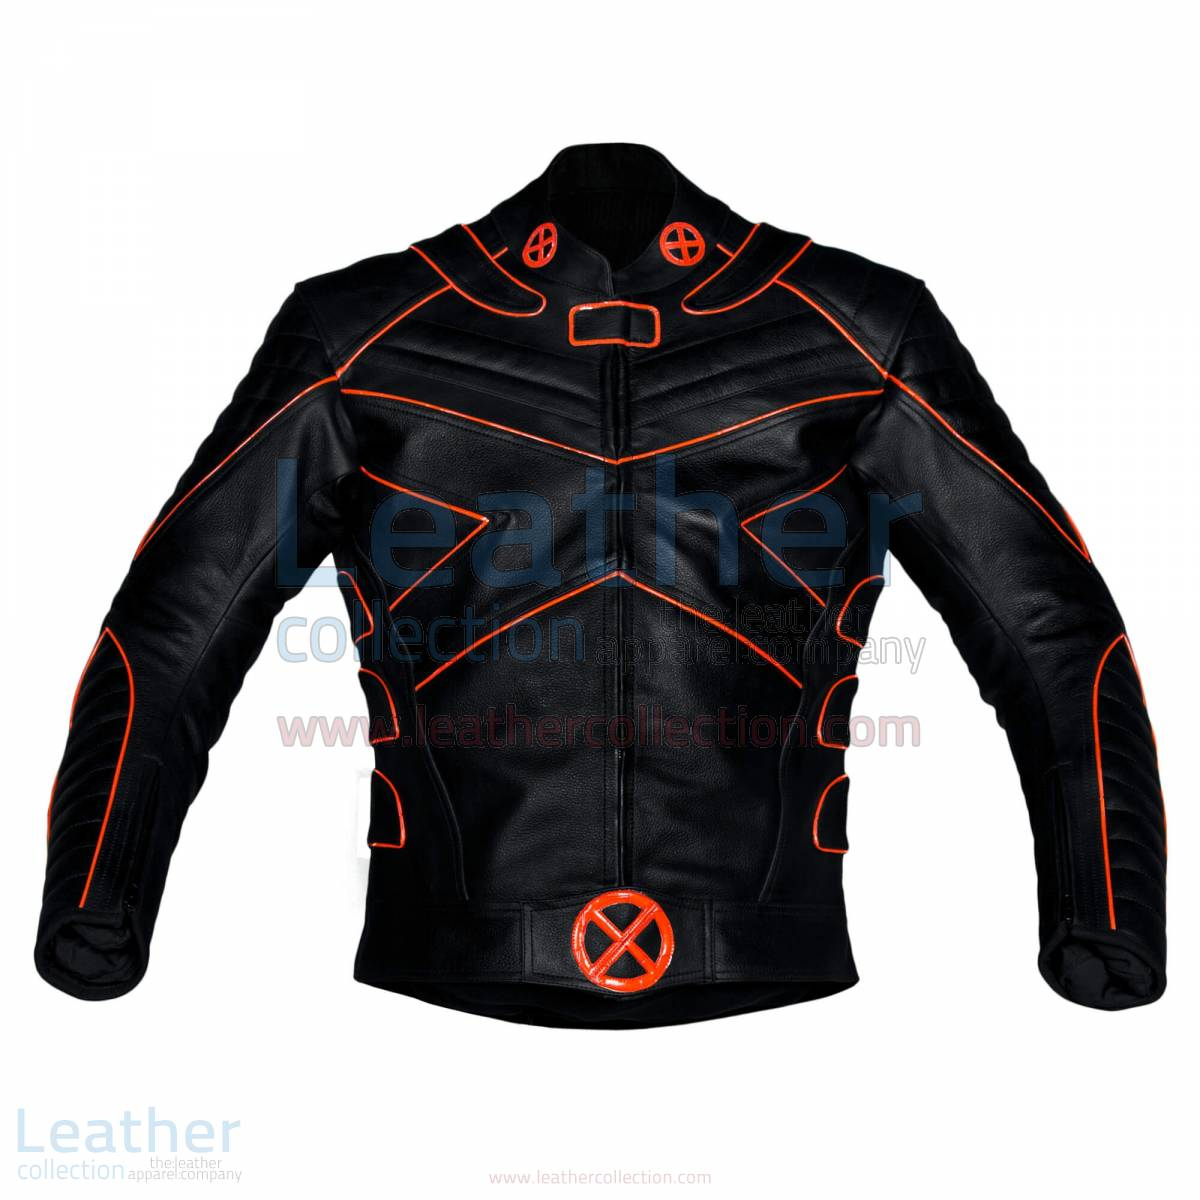 X-Men Motorbike Leather Jacket with Orange Piping